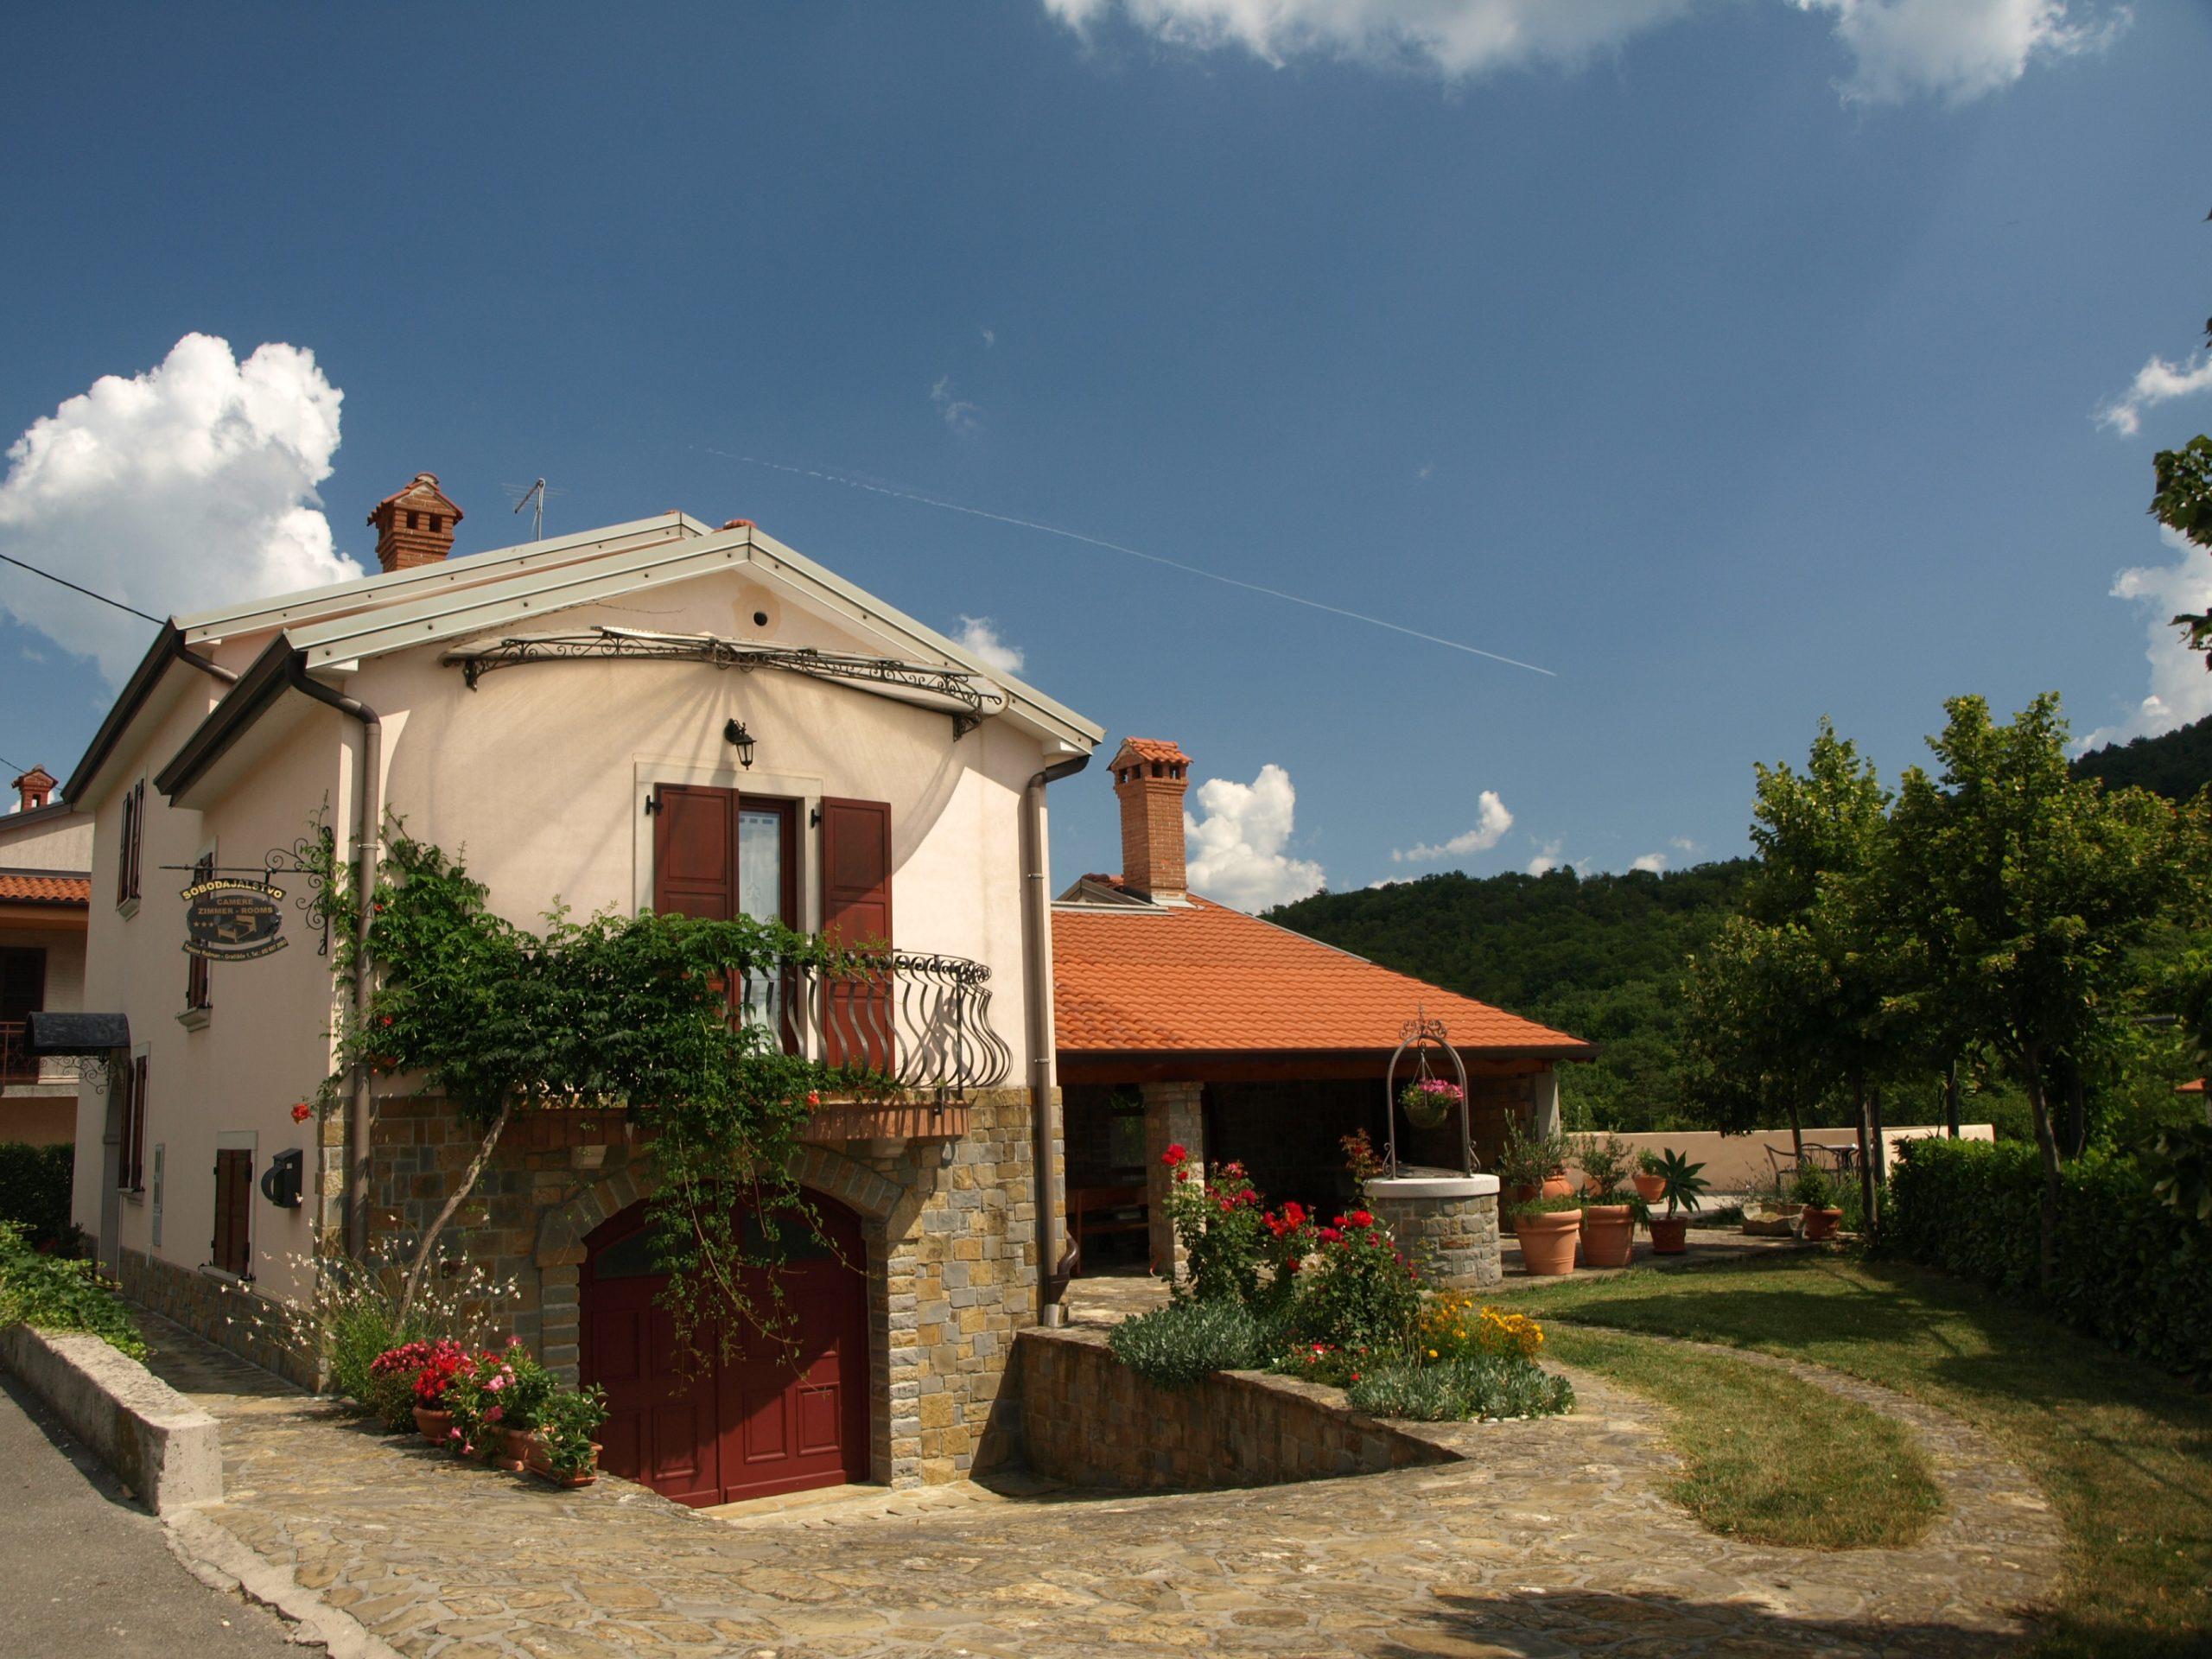 Front view of two storey winery building of Domačija Ražman.